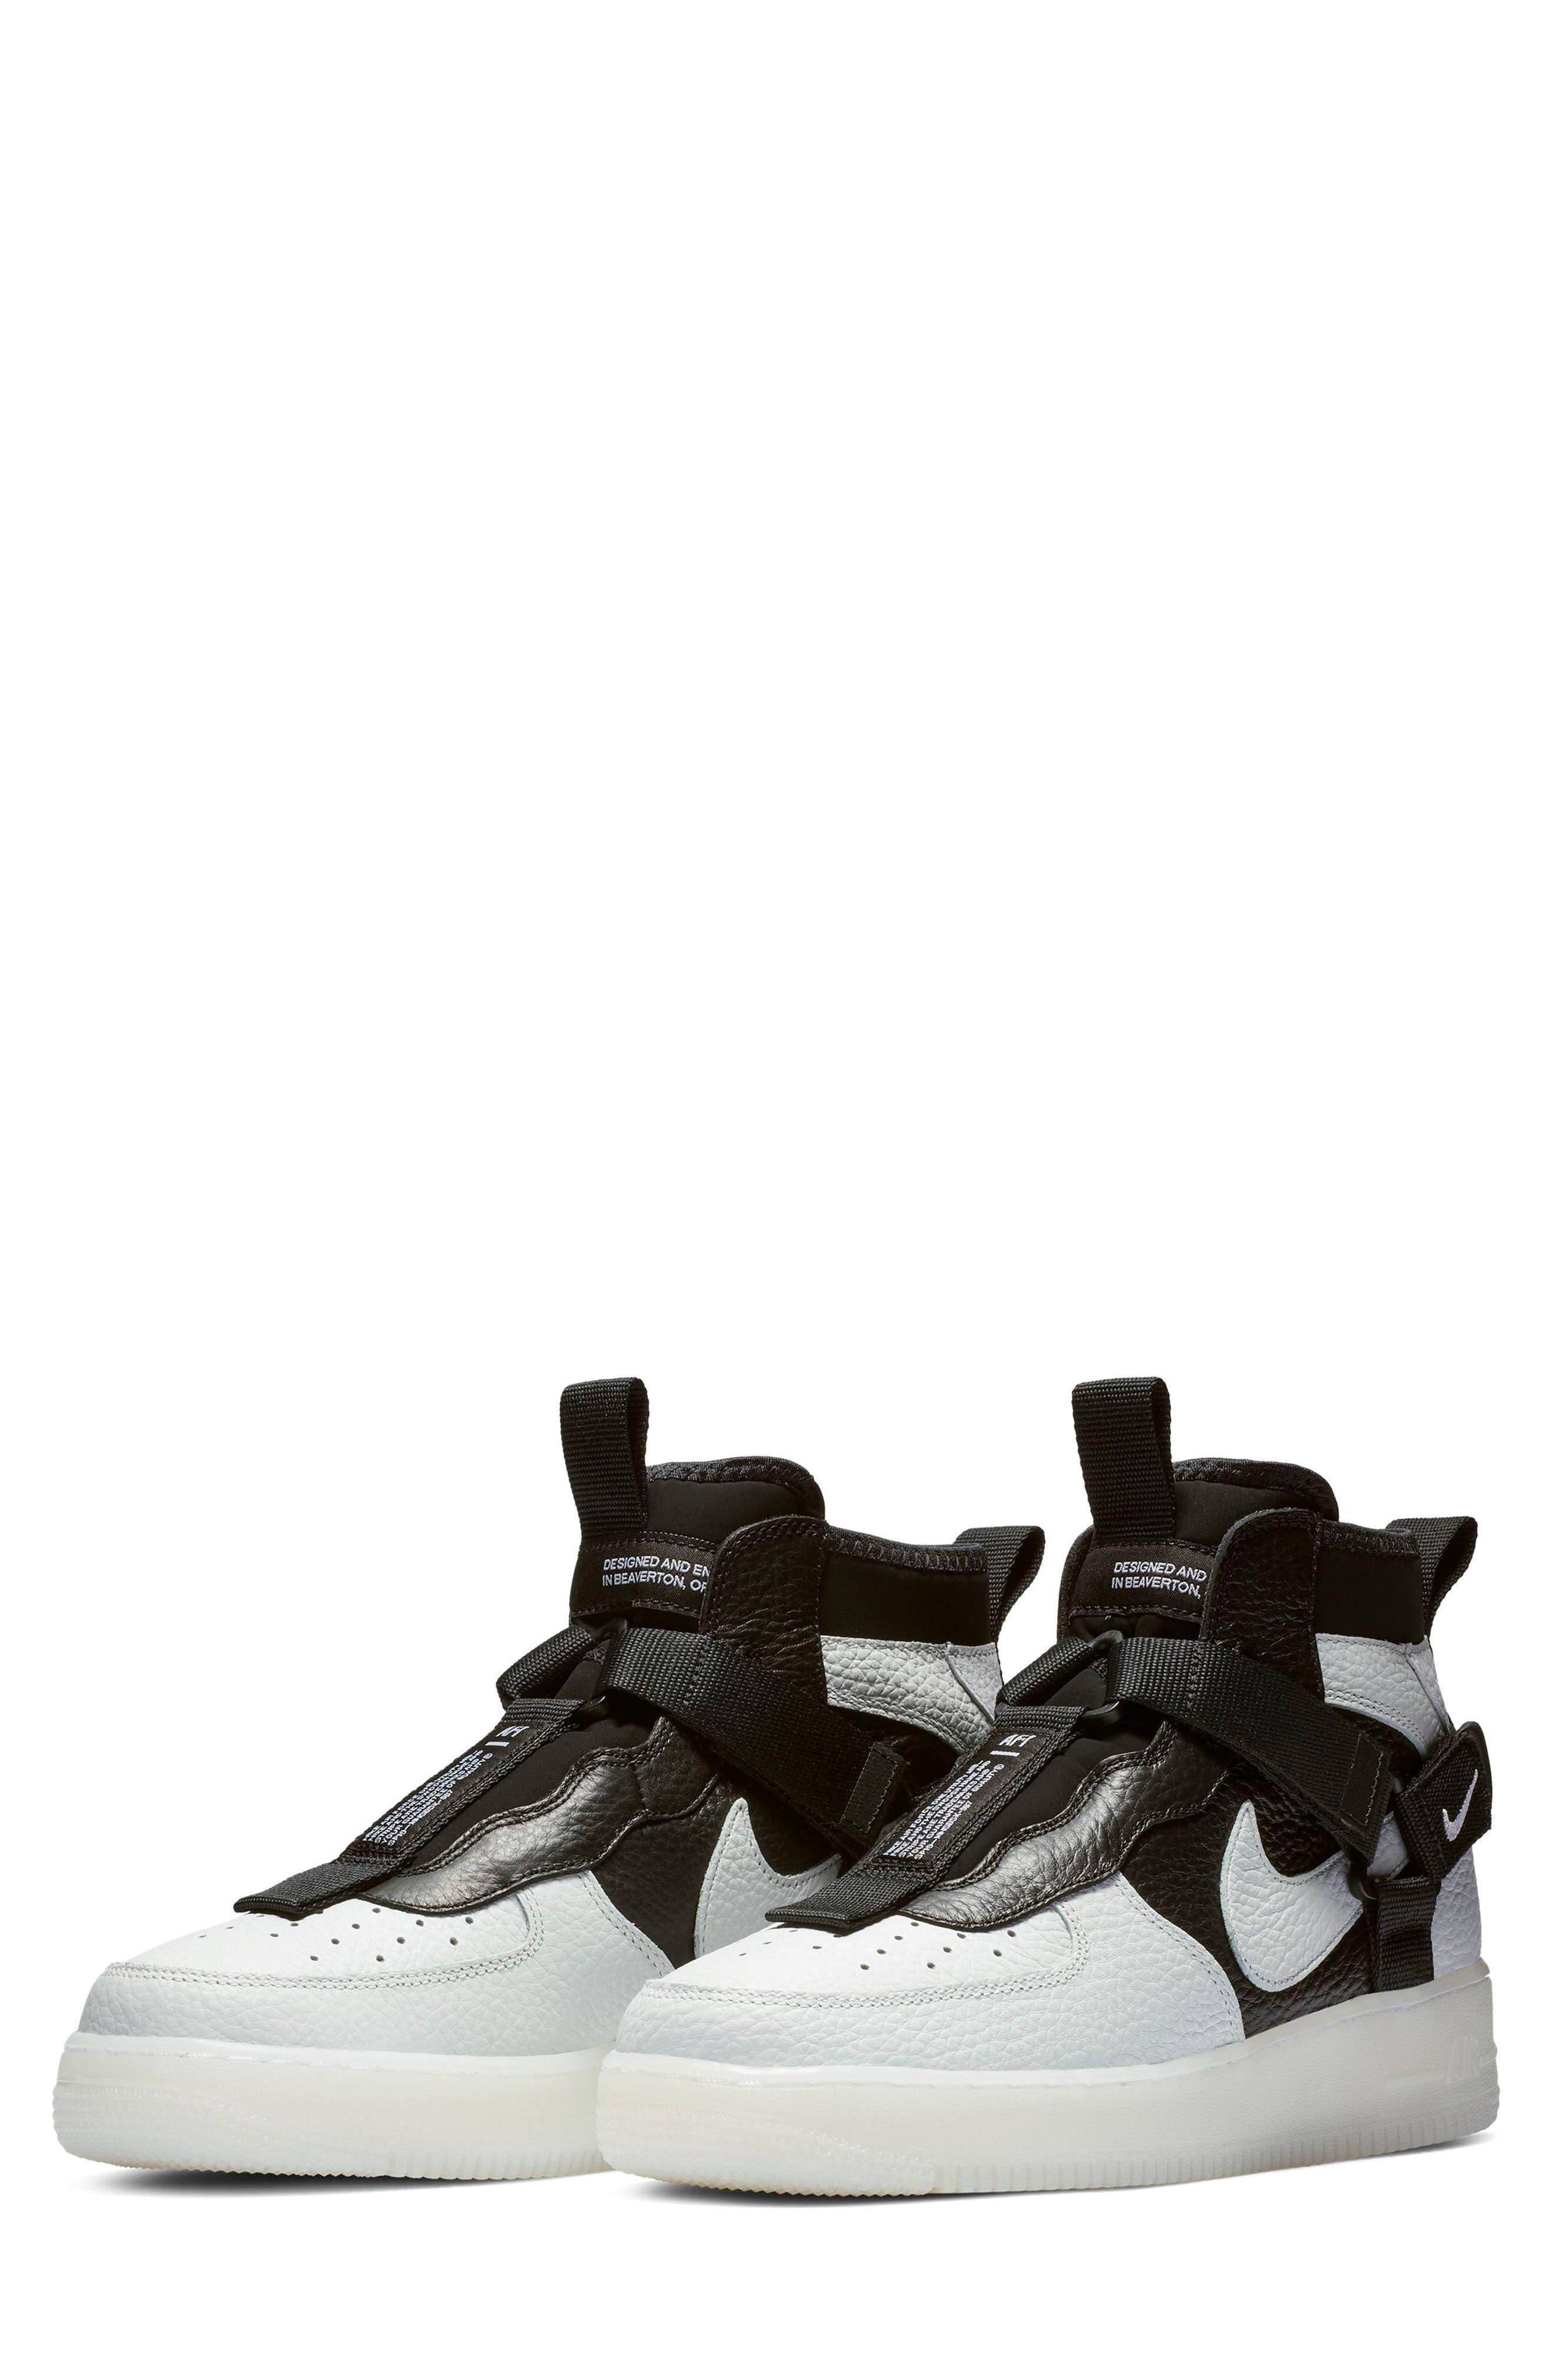 NIKE, Air Force 1 Utility Mid Sneaker, Main thumbnail 1, color, OFF WHITE/ BLACK/ WHITE